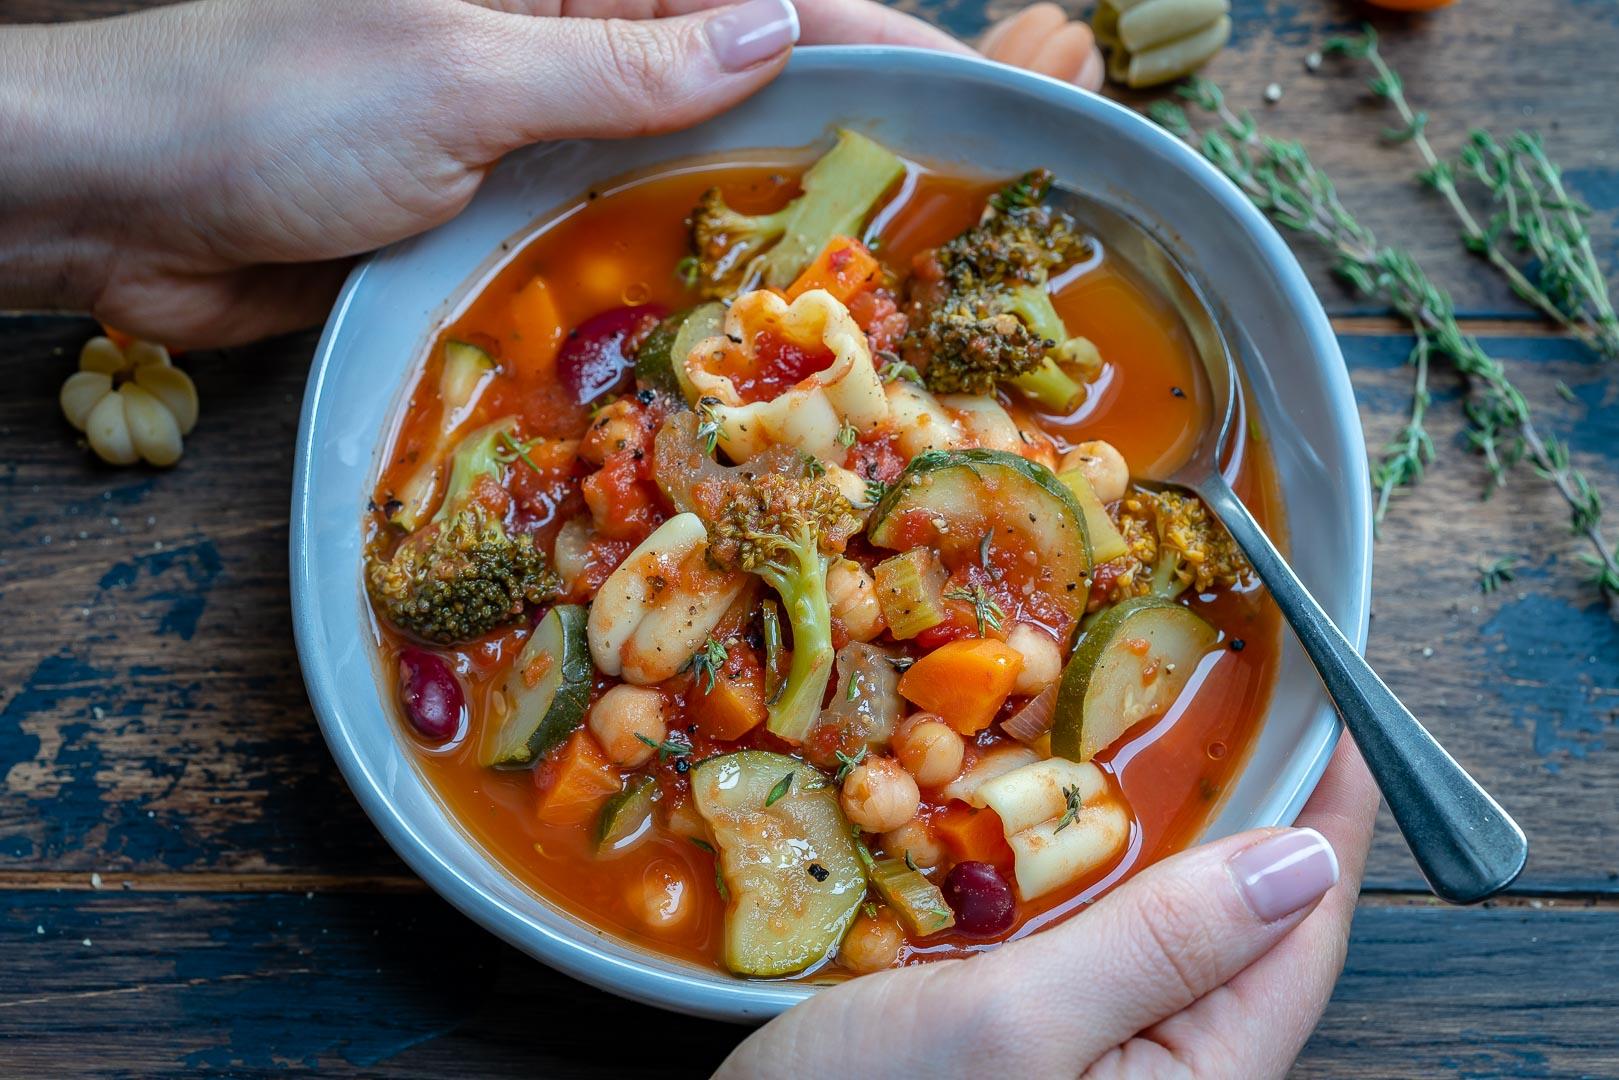 Instant-Pot-Vegan-Minestrone-Soup-Recipe-pop-shop-america